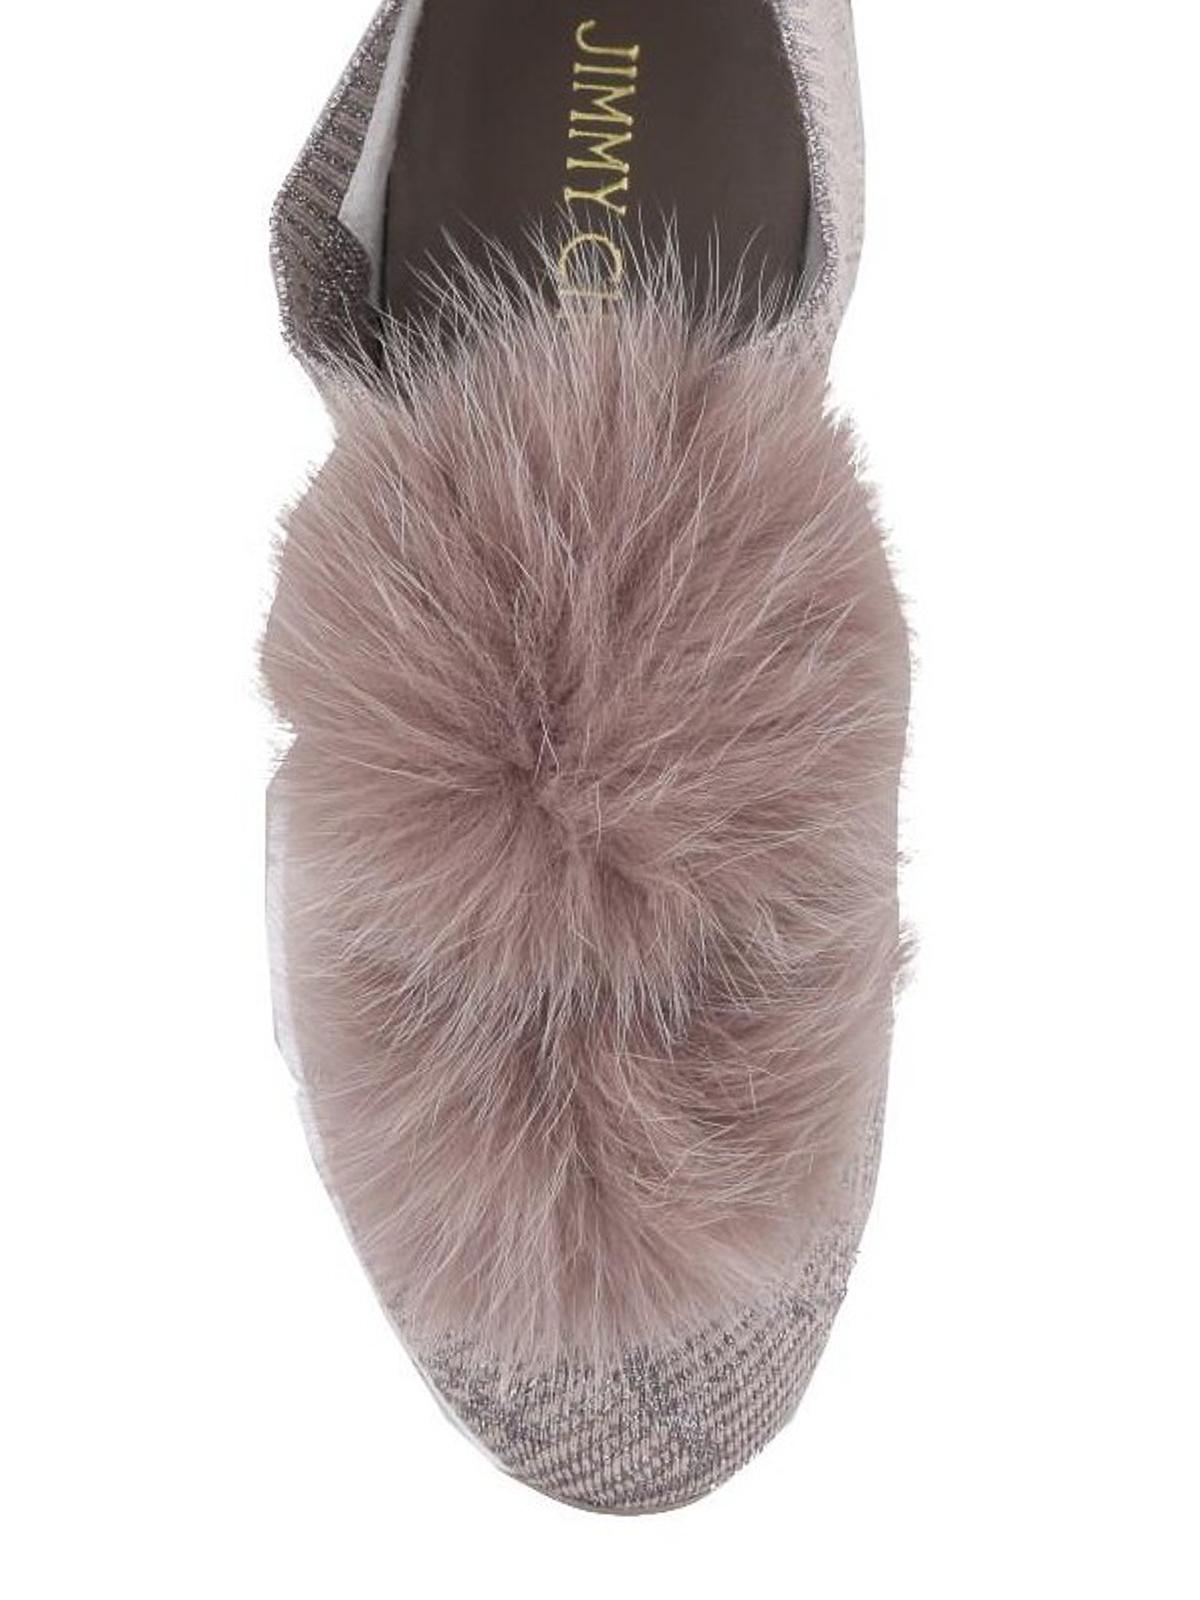 96706a2221dd iKRIX JIMMY CHOO  trainers - Norway fox fur pompom slip-on shoes